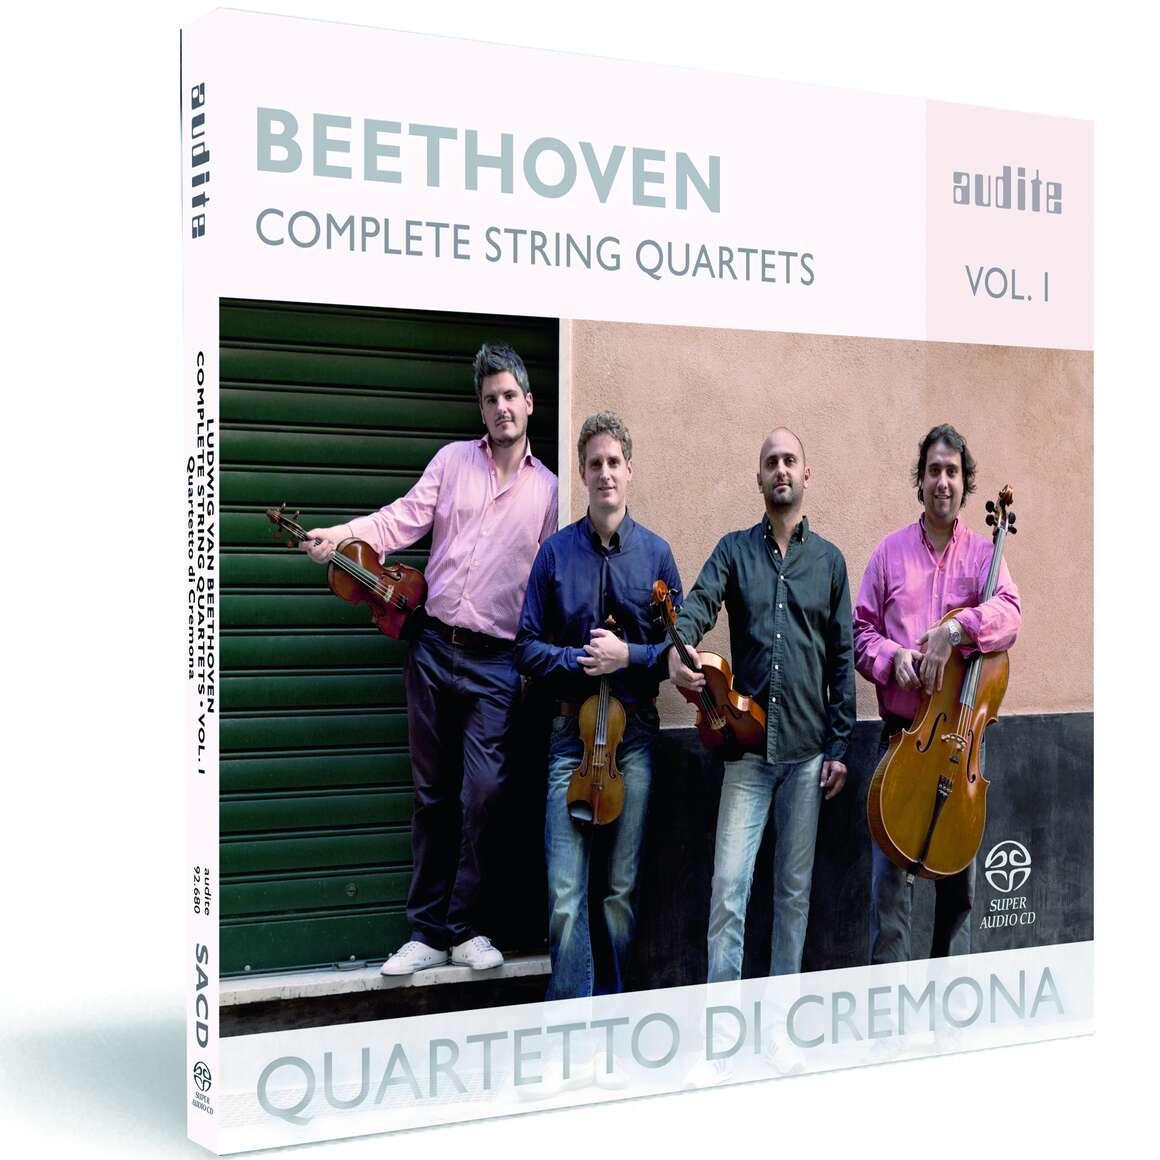 Ludwig van Beethoven: Complete String Quartets - Vol. 1